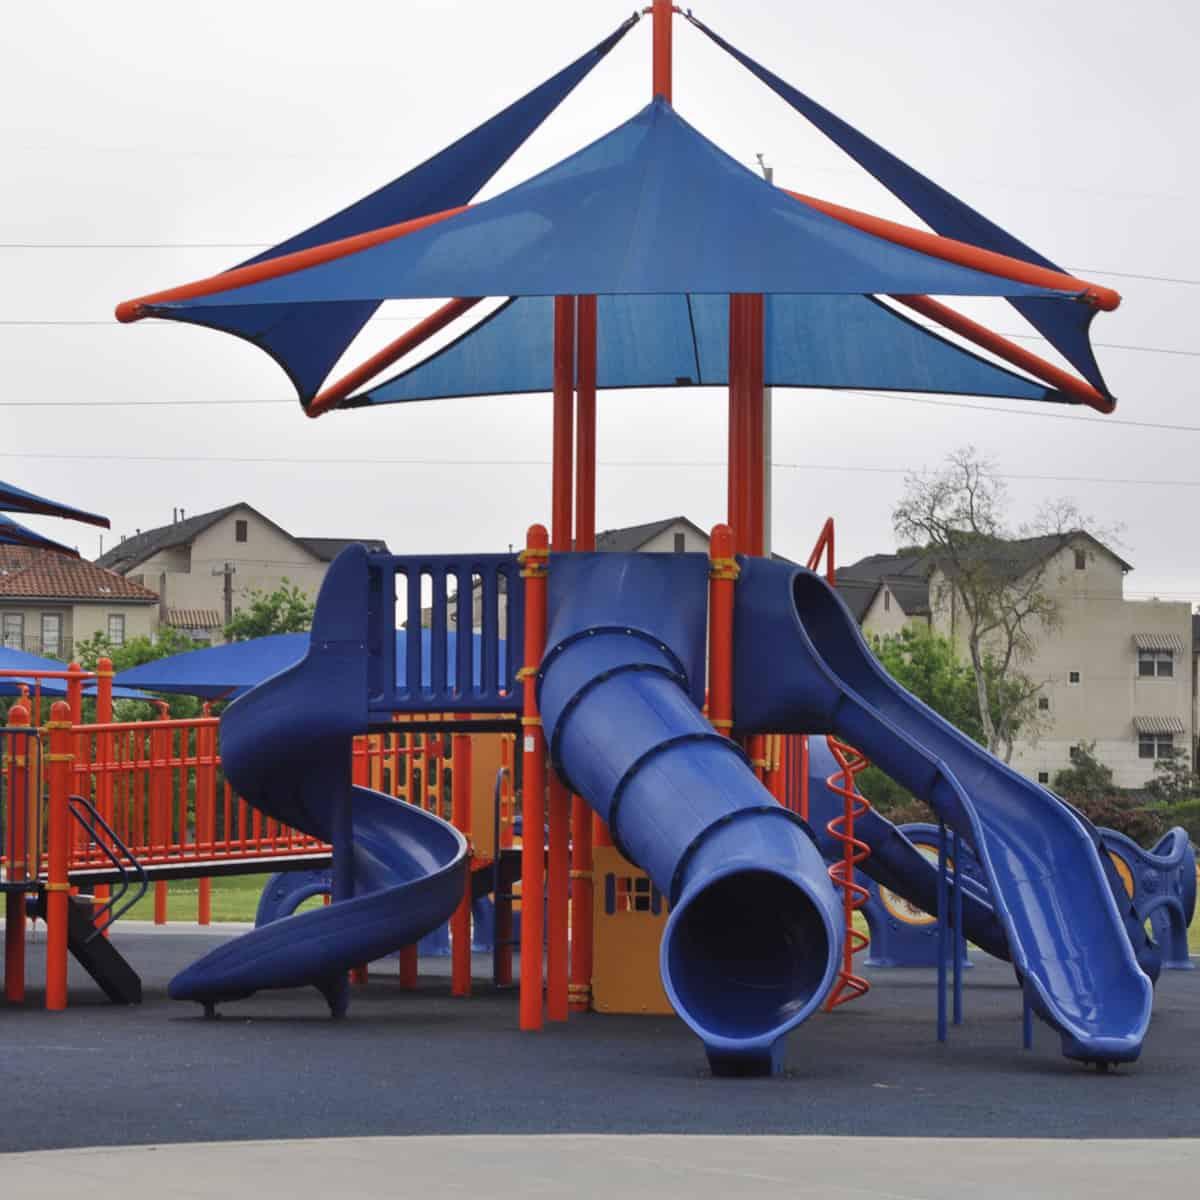 West Gray Rec Center Playground